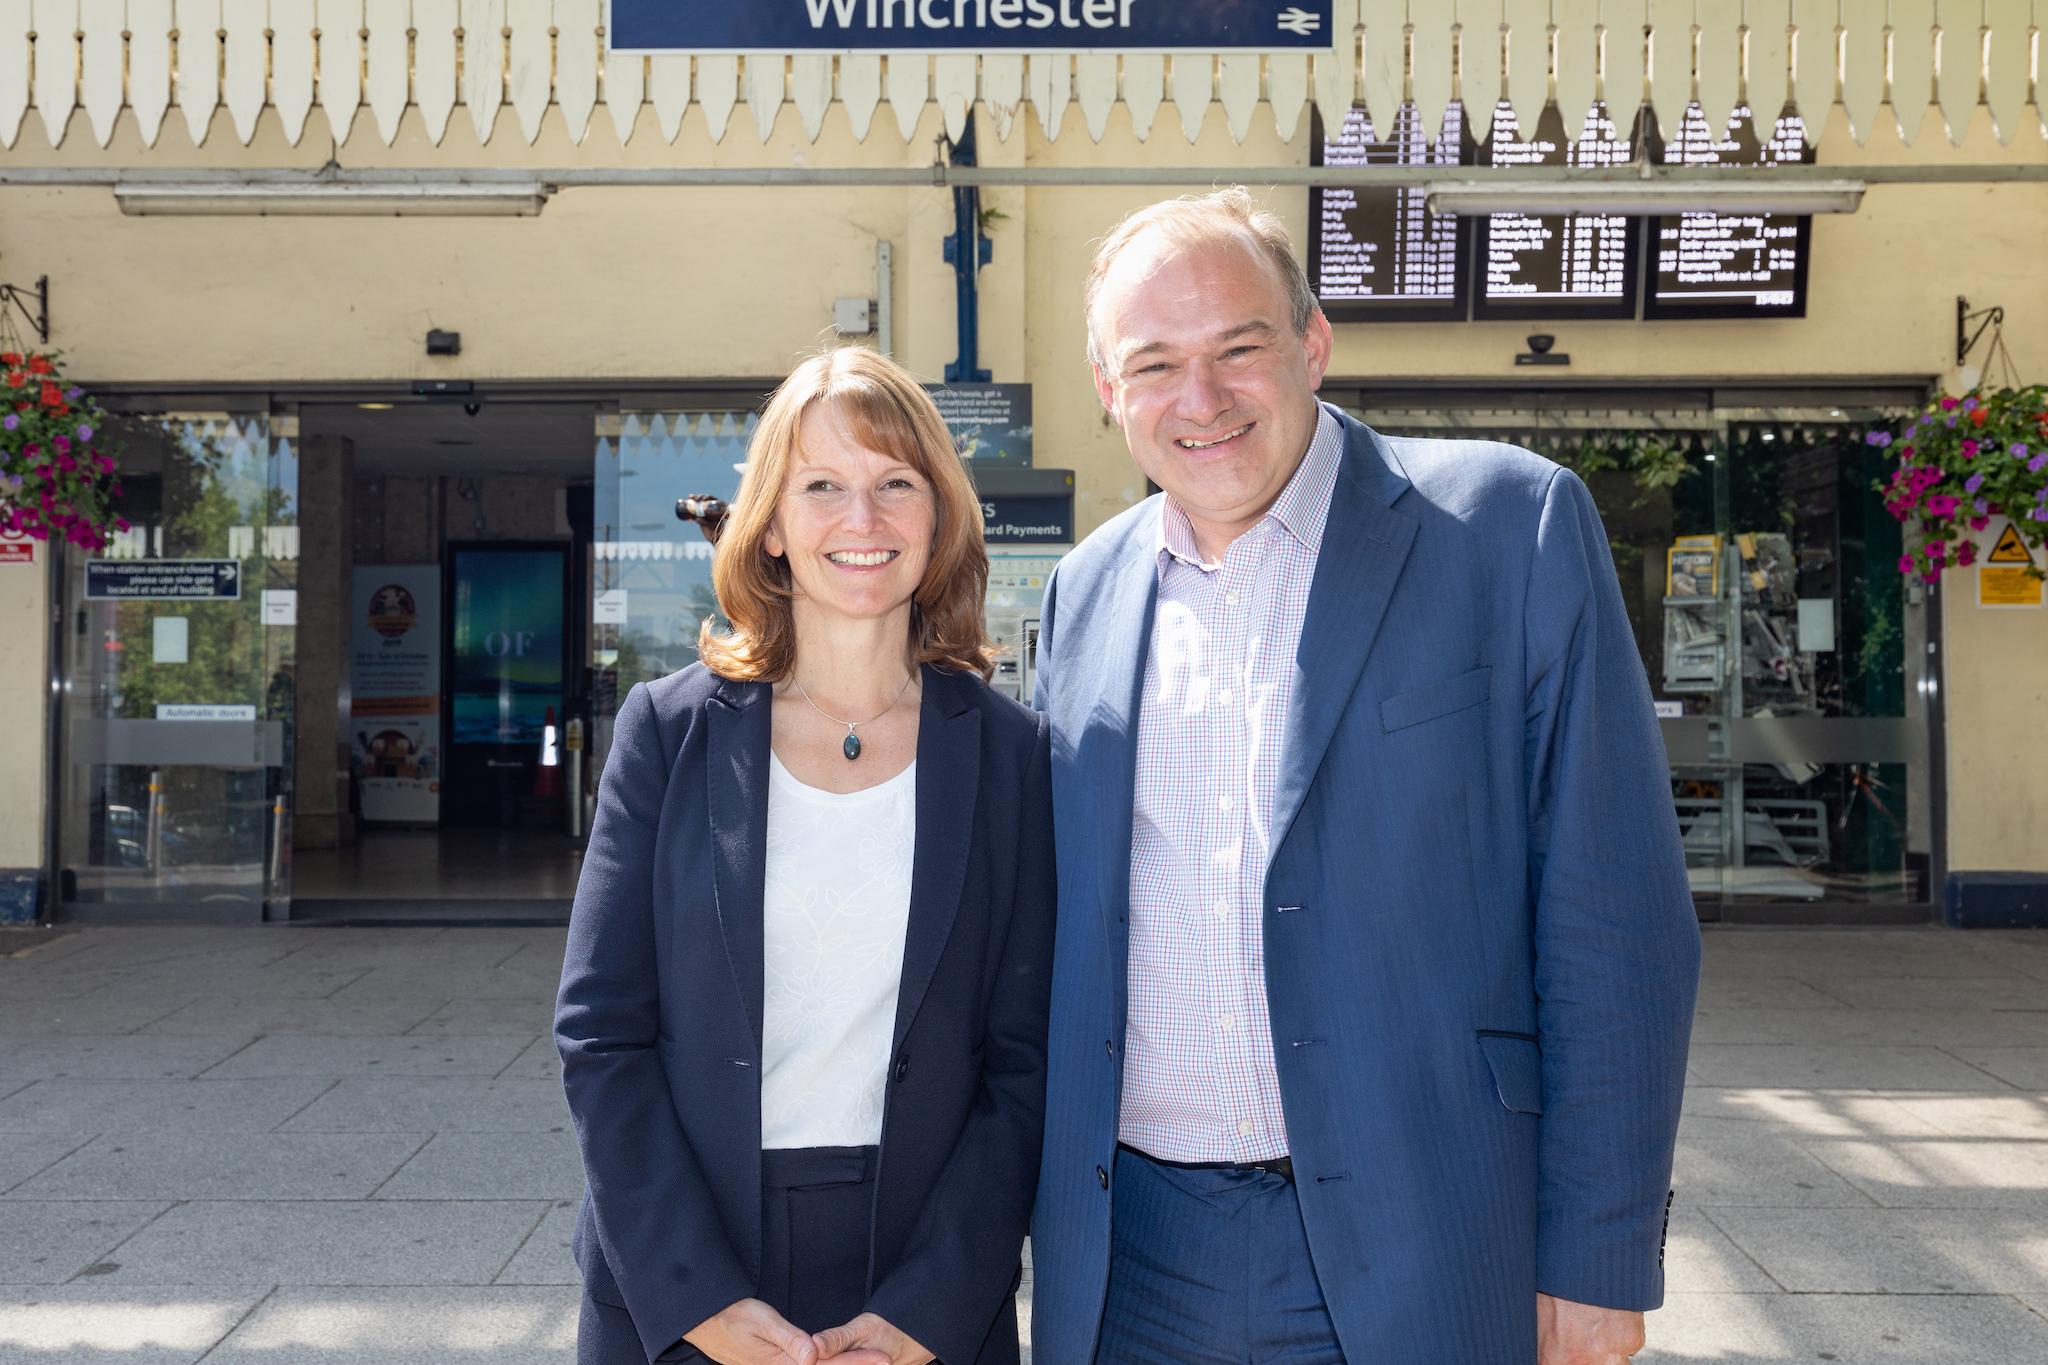 Paula Ferguson & Ed Davey at Winchester Rail Station